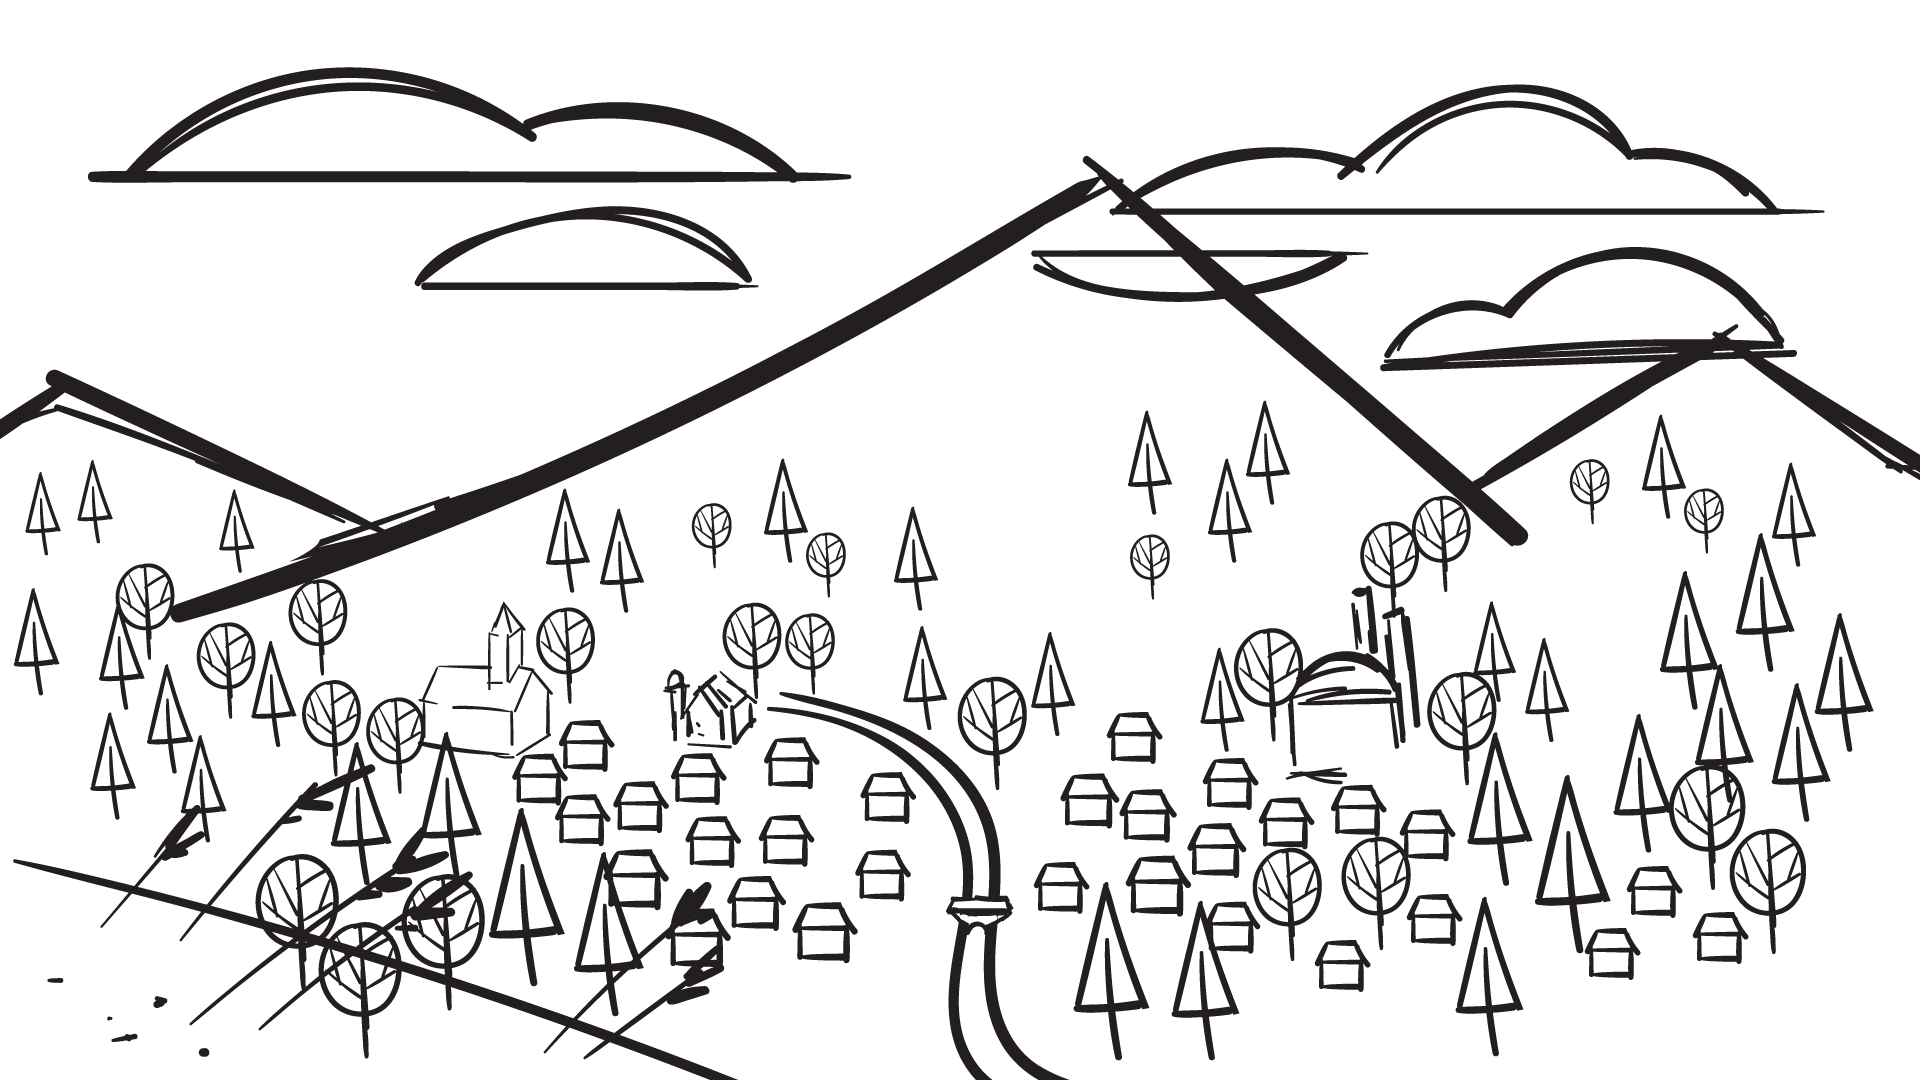 Animated pilot sketch